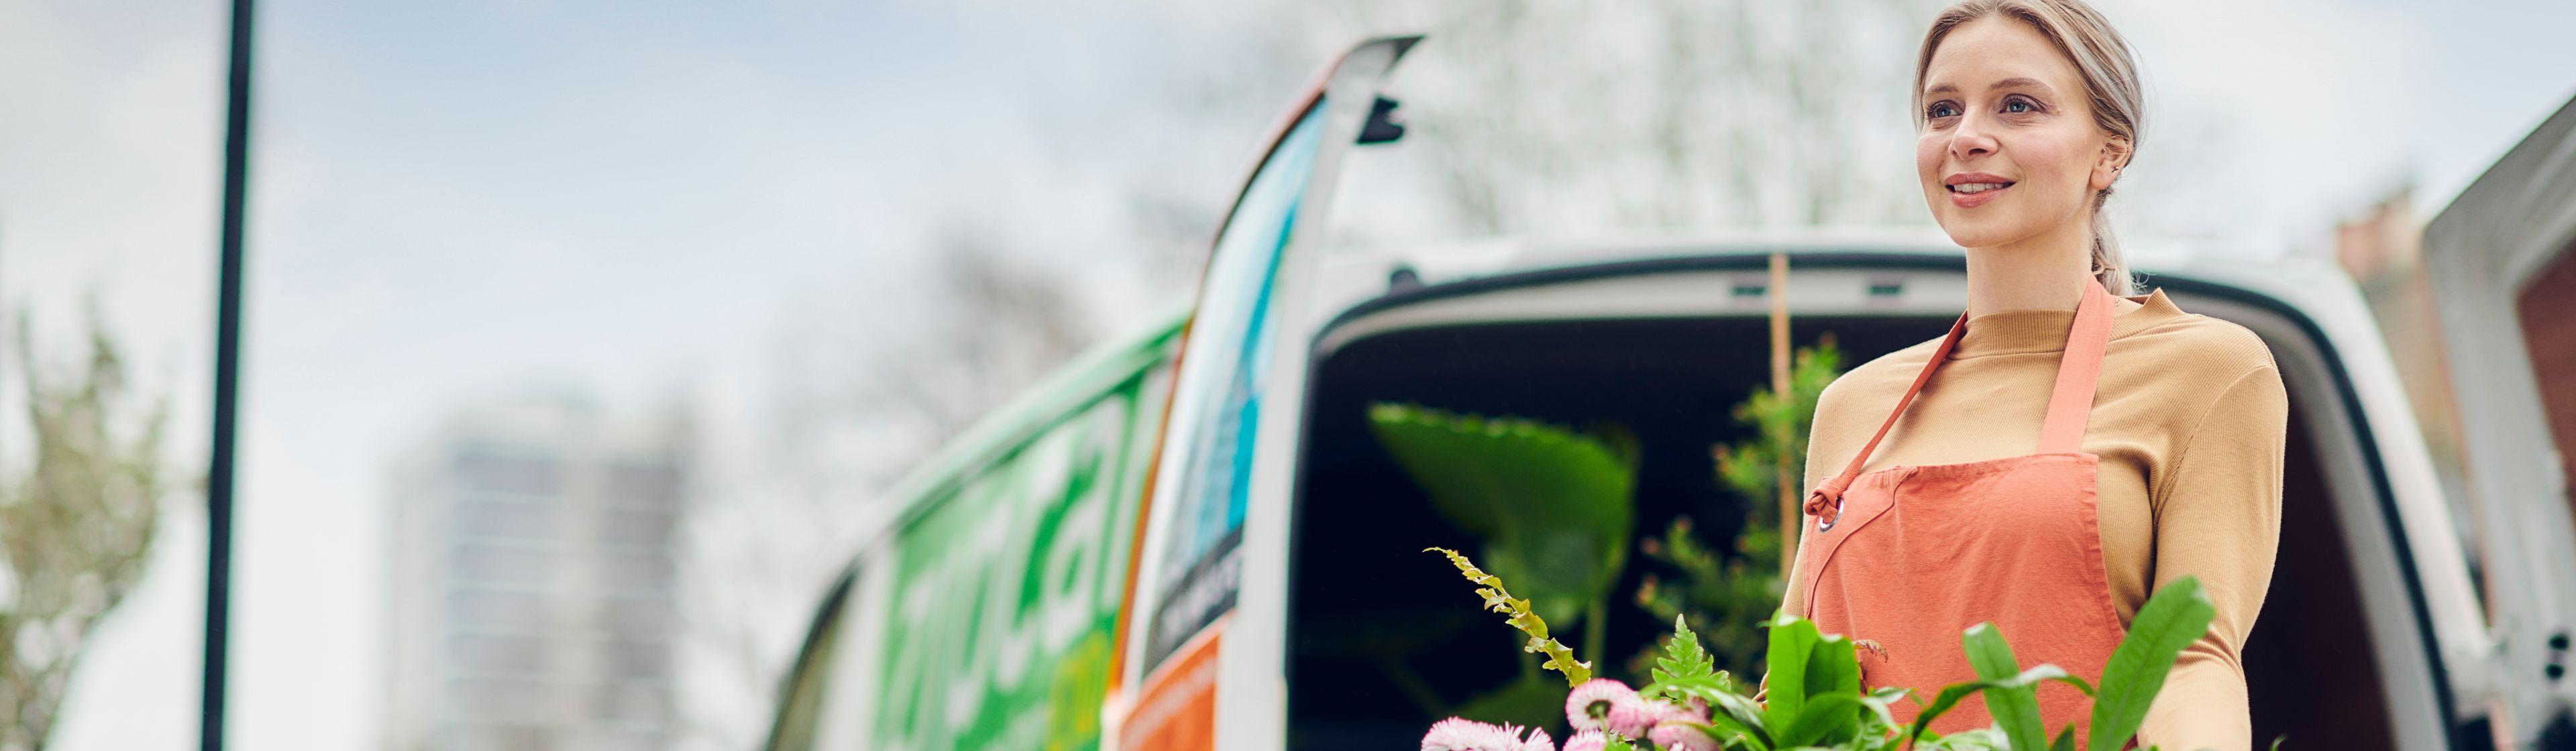 woman doing deliveries with zipcar van